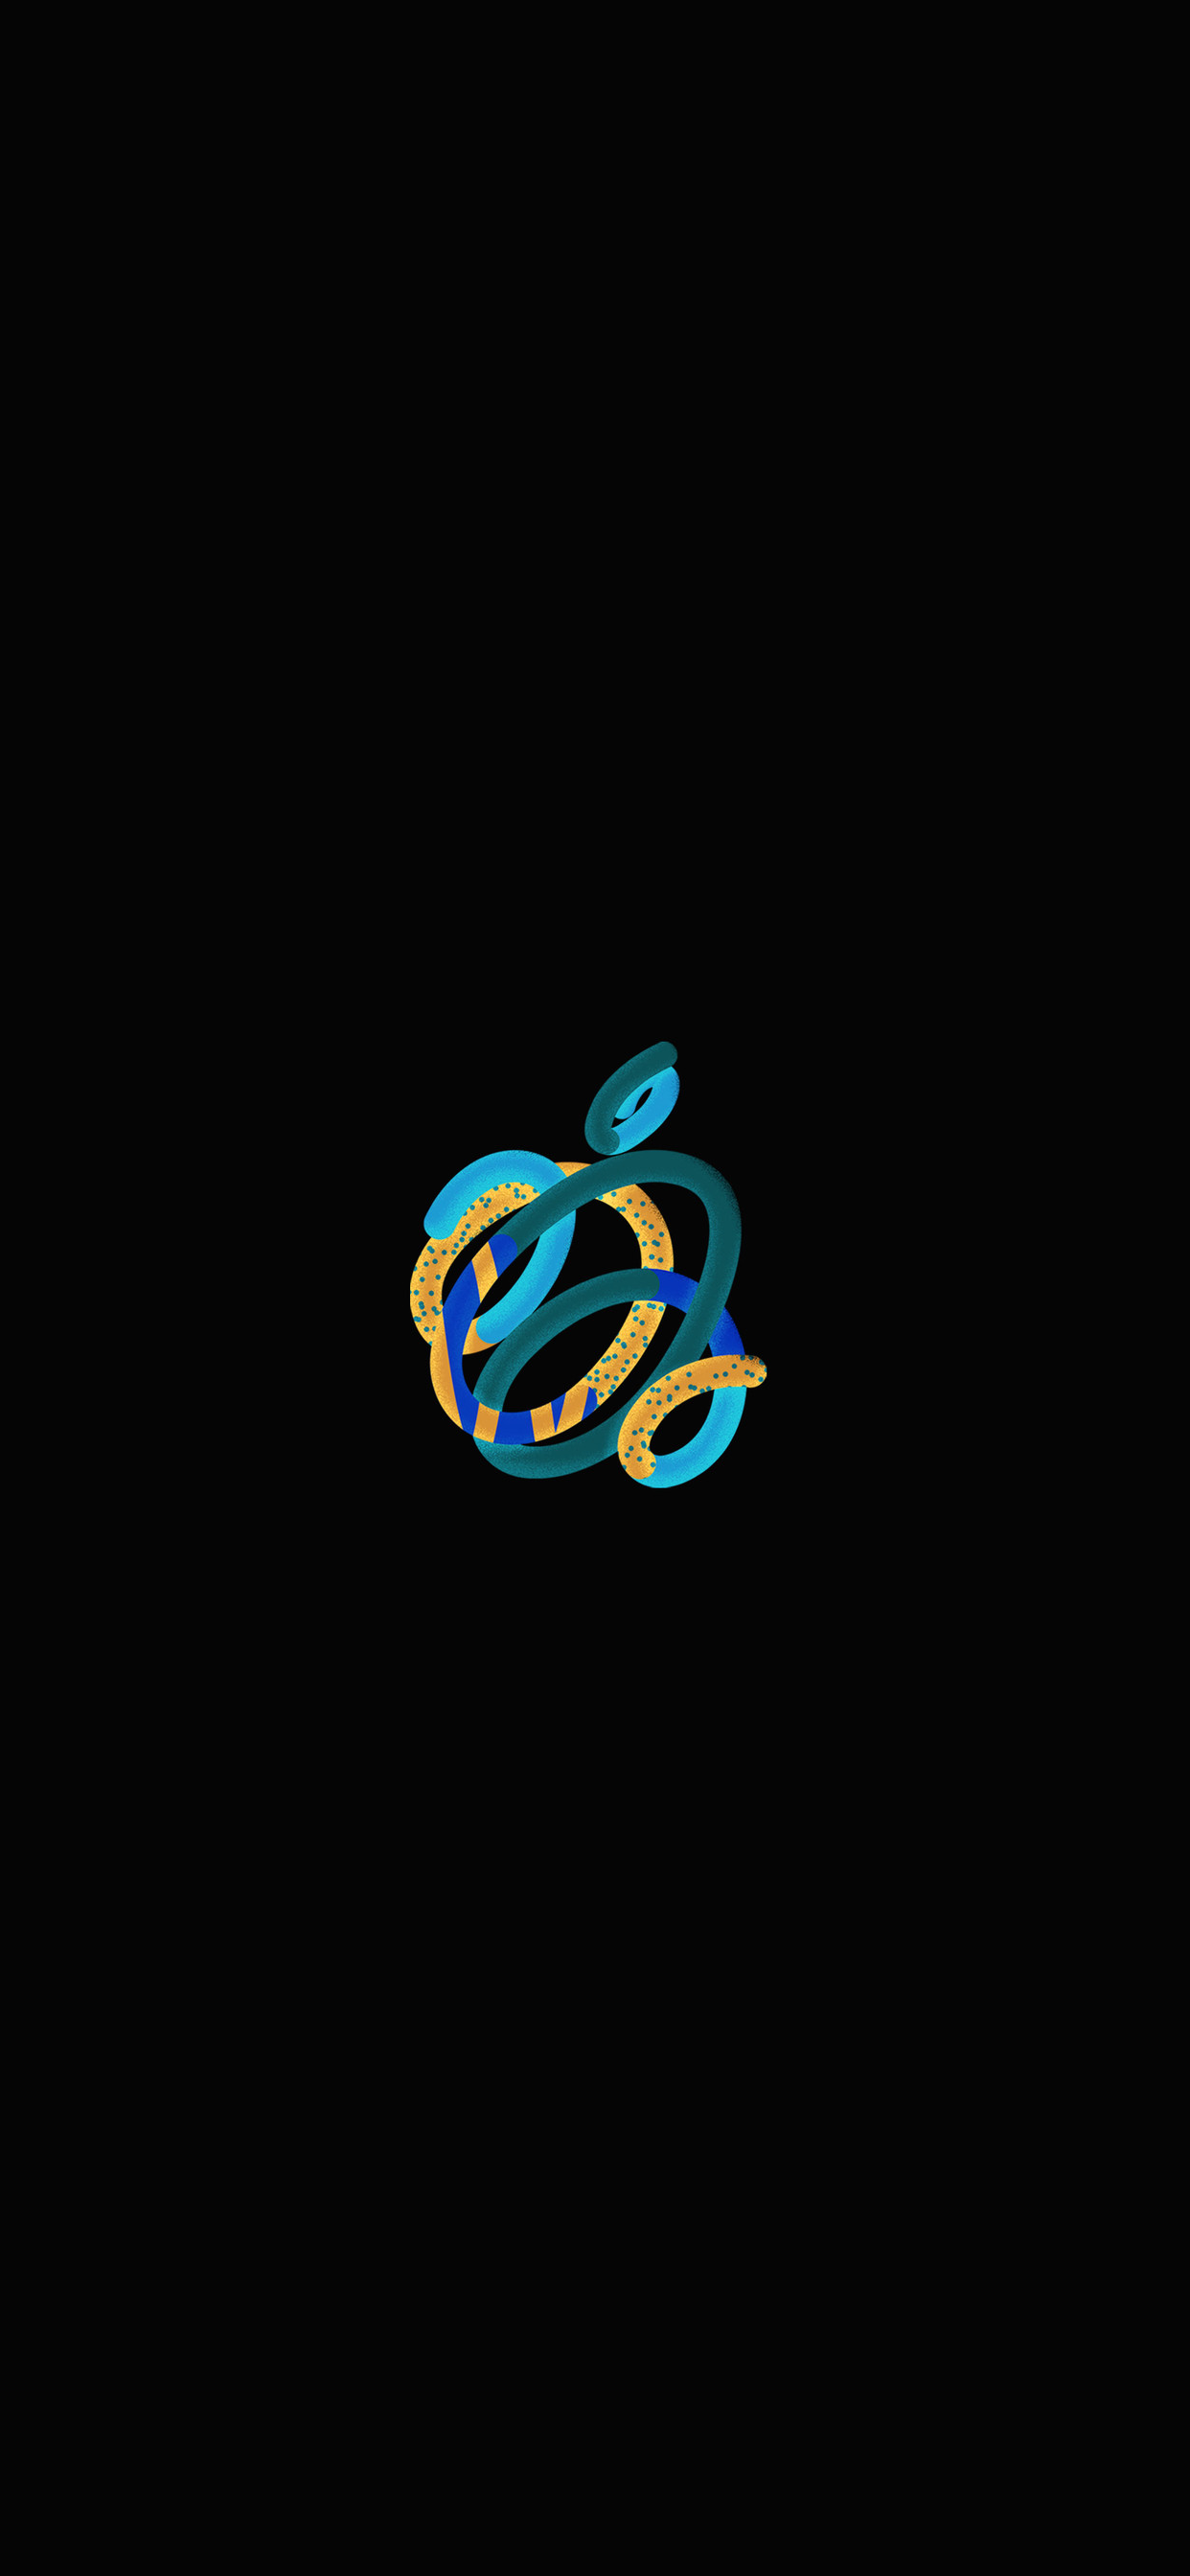 iPhone wallpaper apple logo 1 Apple logo